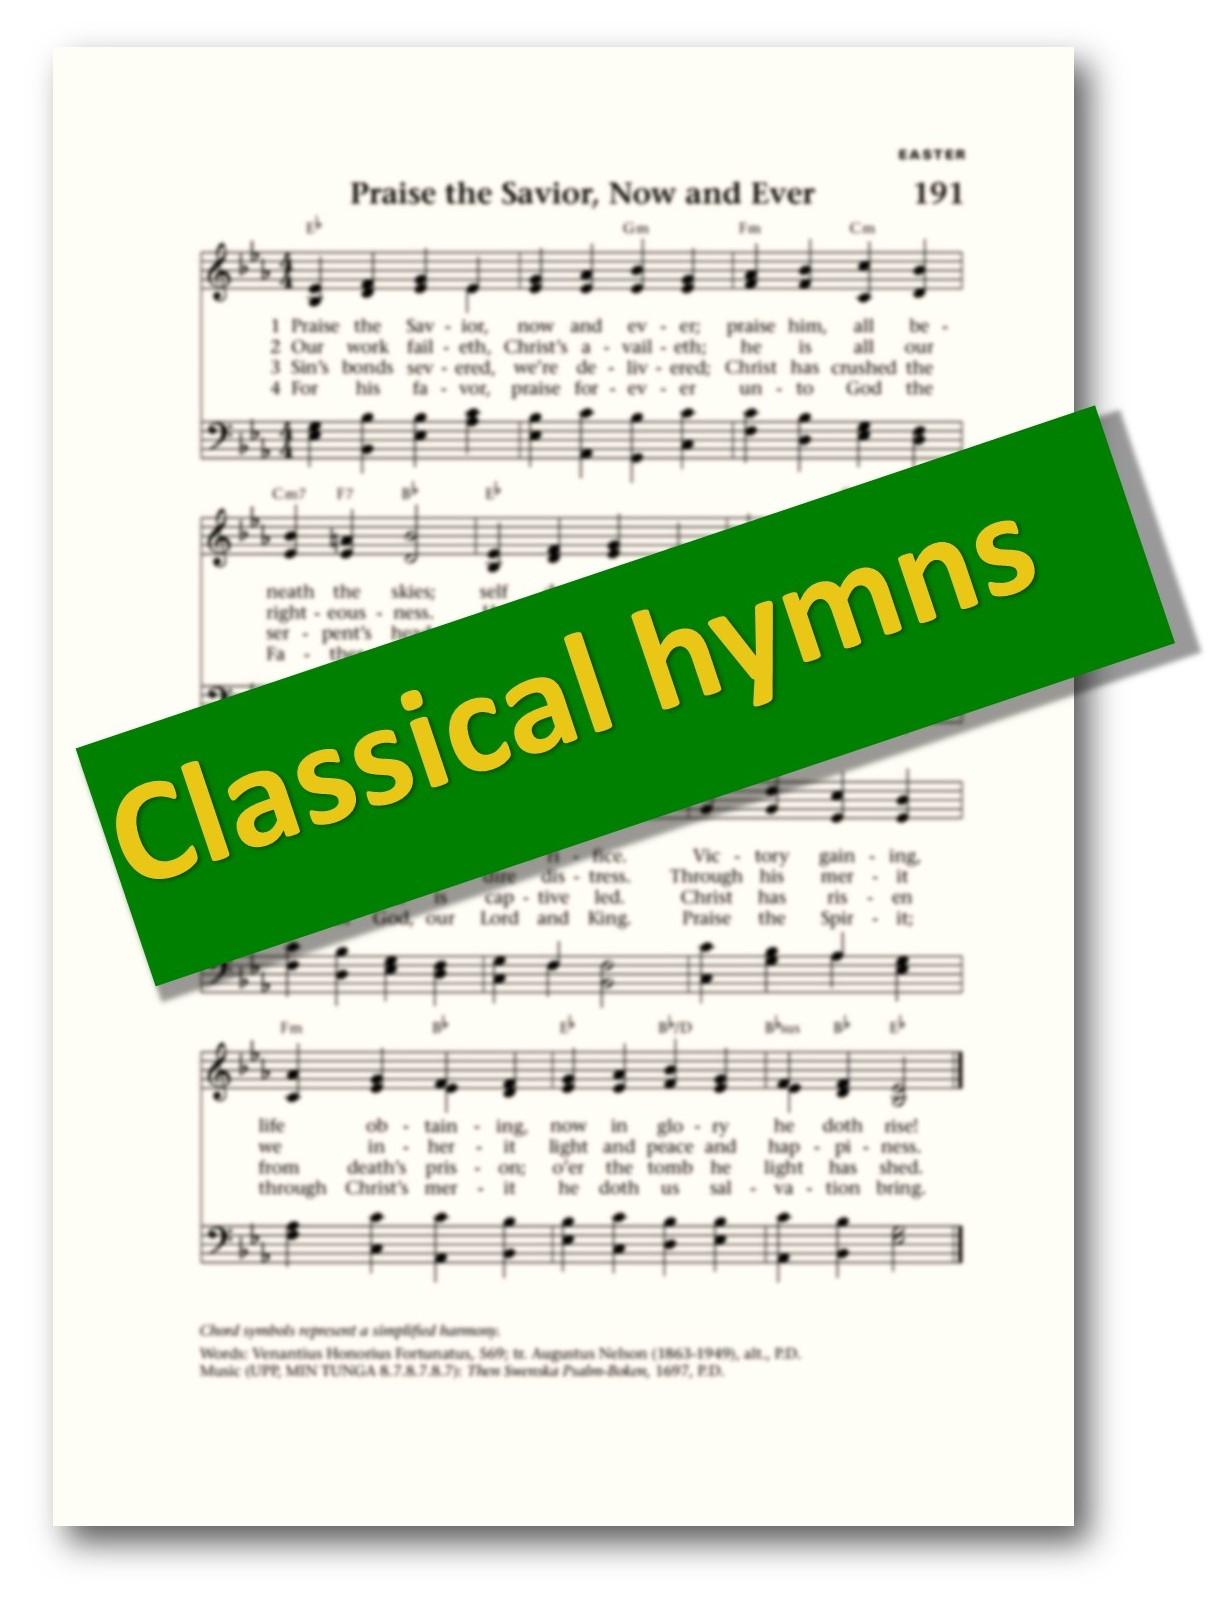 engelse hymns meezingen 2017 youtube